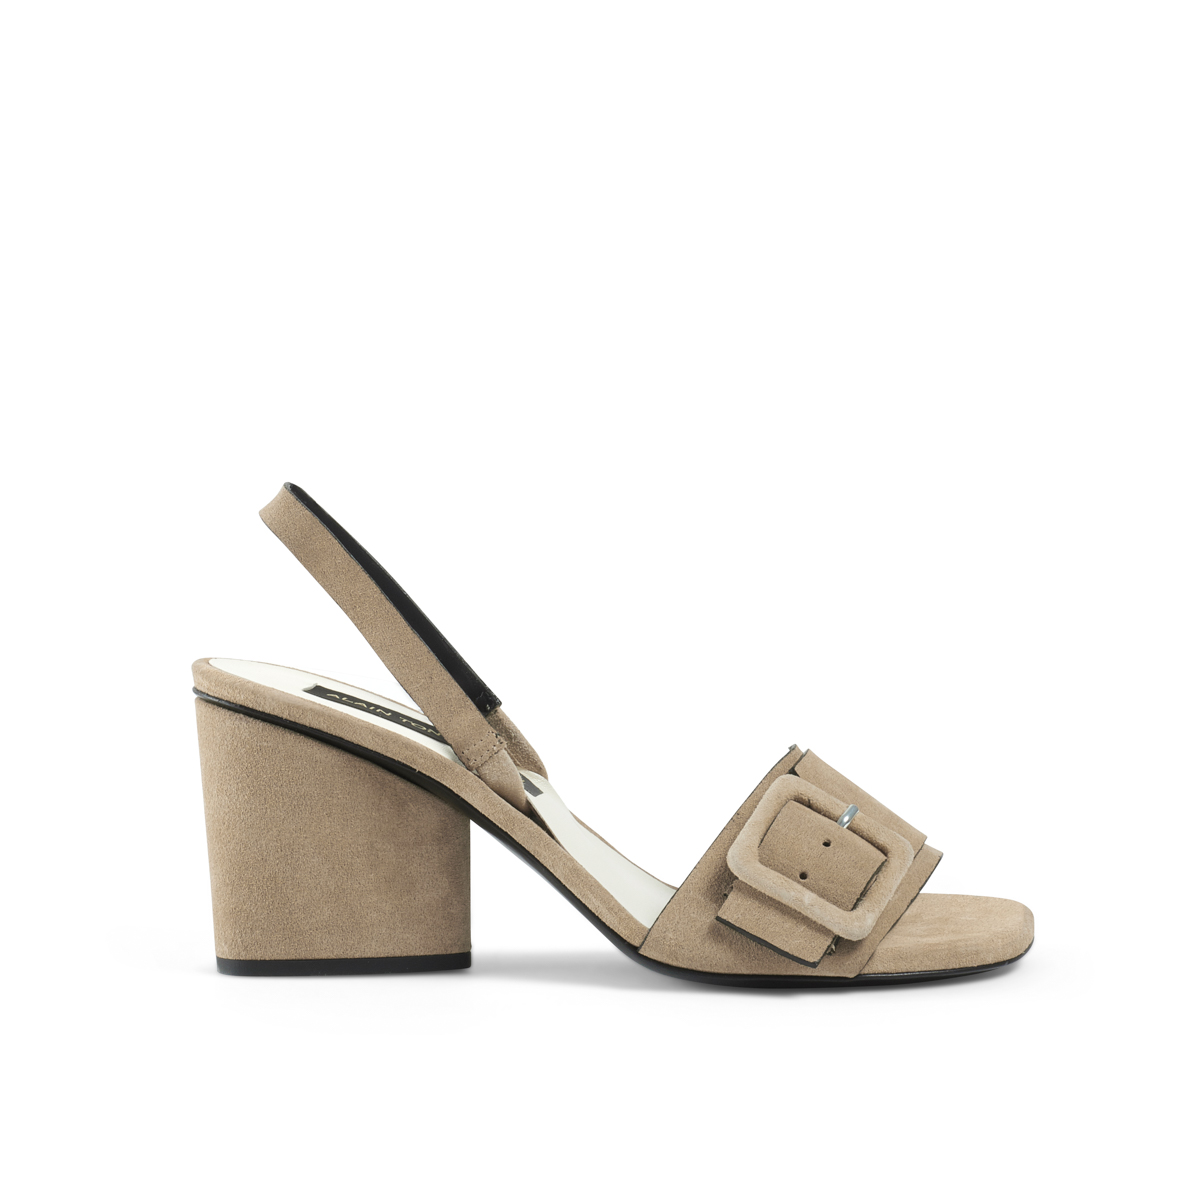 031_alaintondowski_springsummer2017_shoes_3033